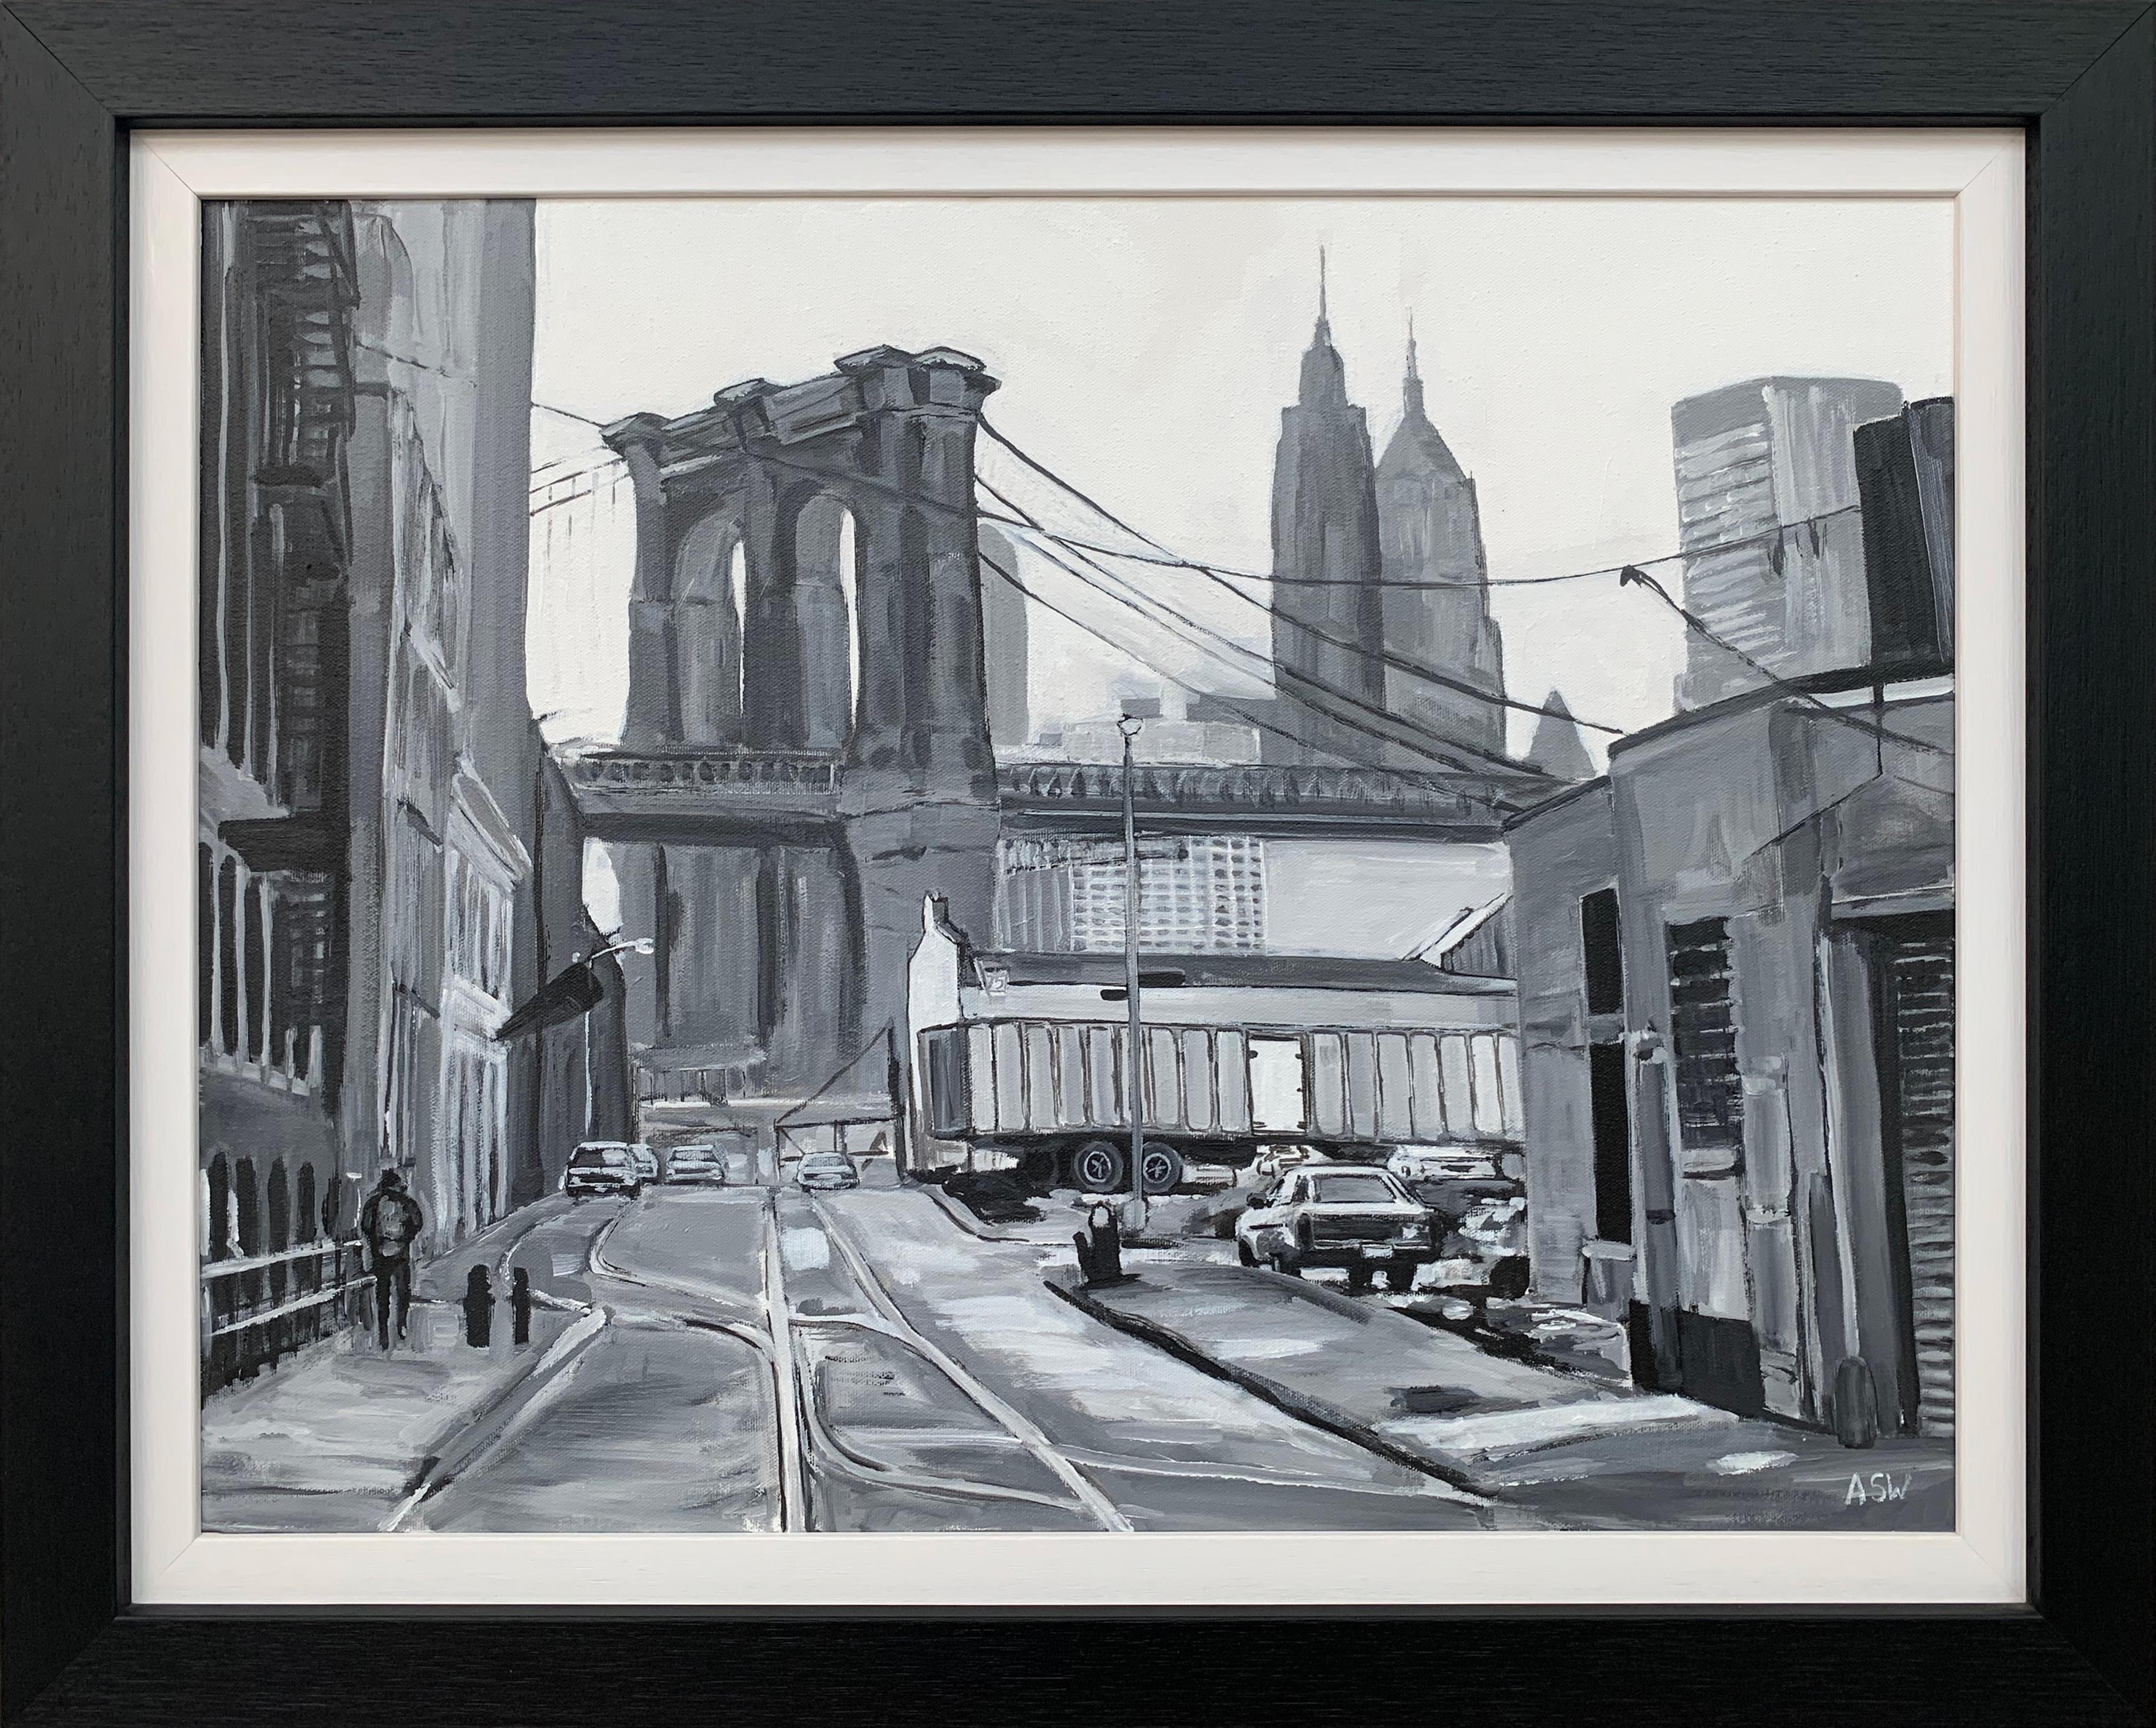 Black & White Brooklyn Bridge New York City by Contemporary British Urban Artist